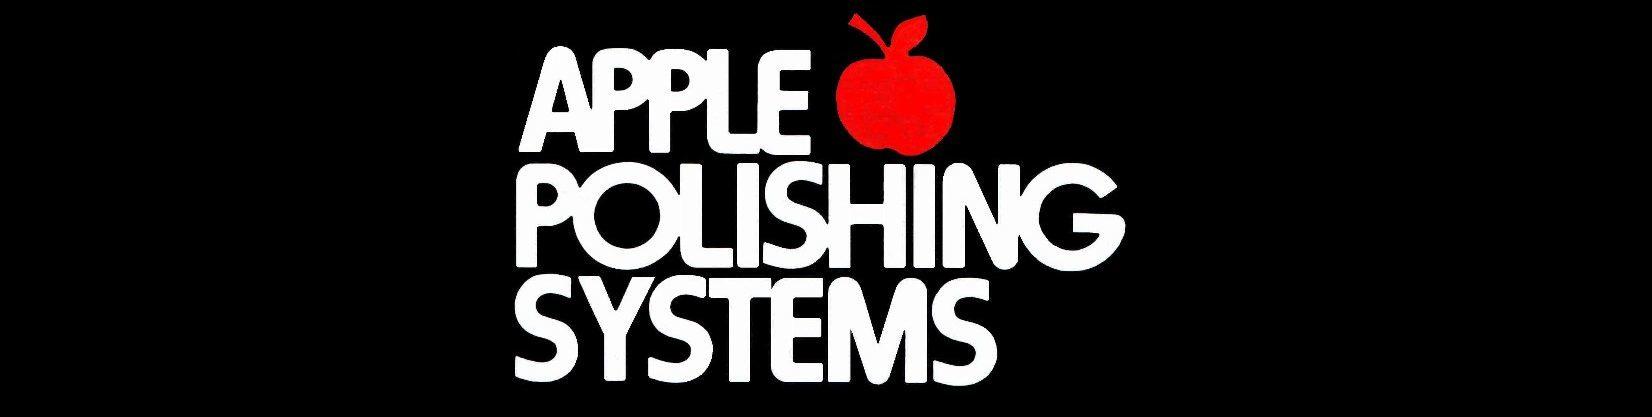 Apple Polishing Systems